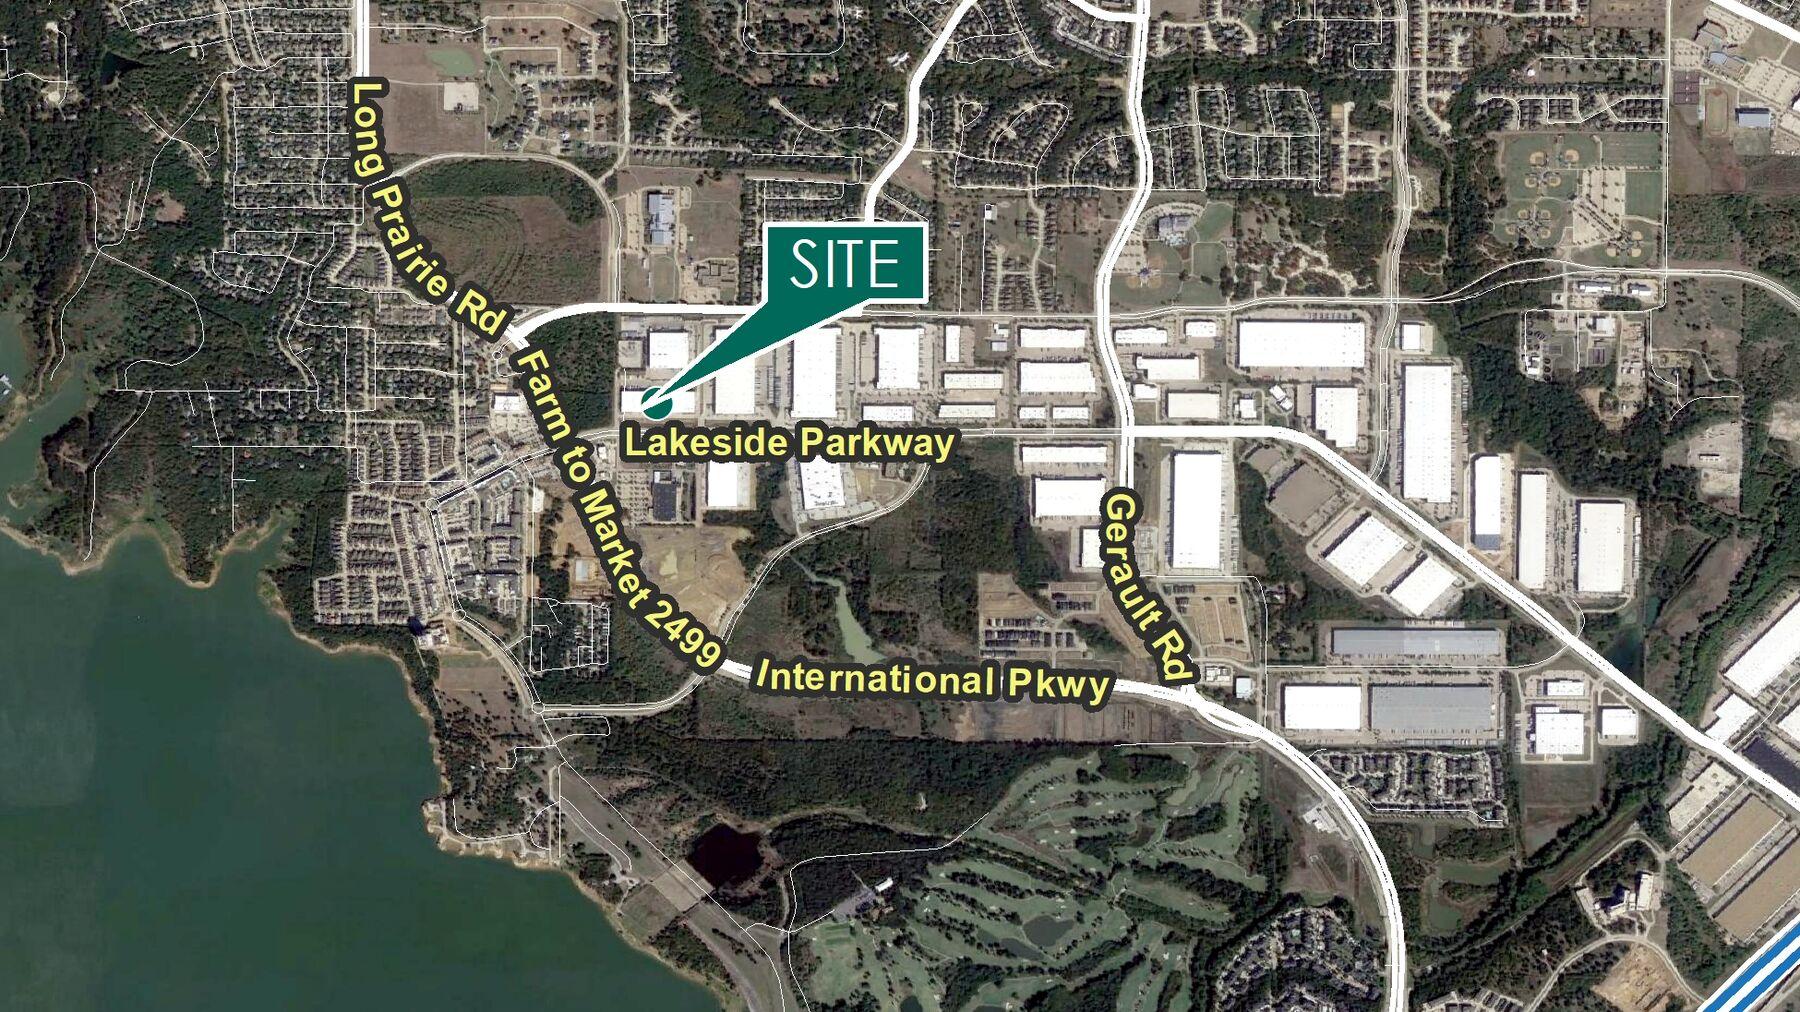 DPM-Prologis-Flower-Mound-6-DAL01406-2000-Lakeside-Parkway_AerialMap.jpg